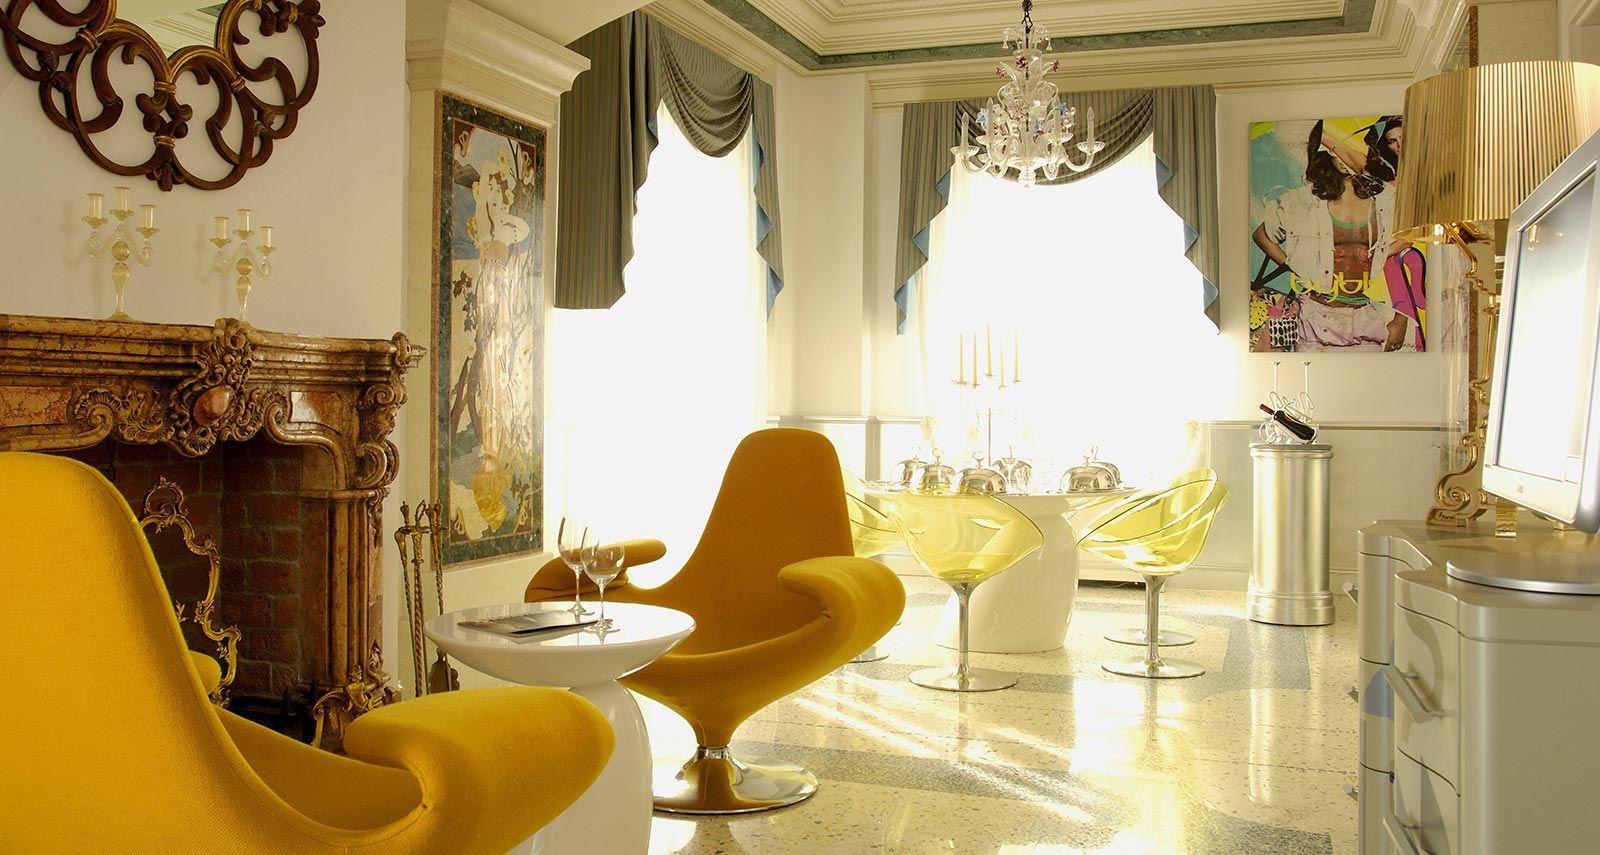 Byblos Art Hotel Luxury Verona Official Site Villa Amistà